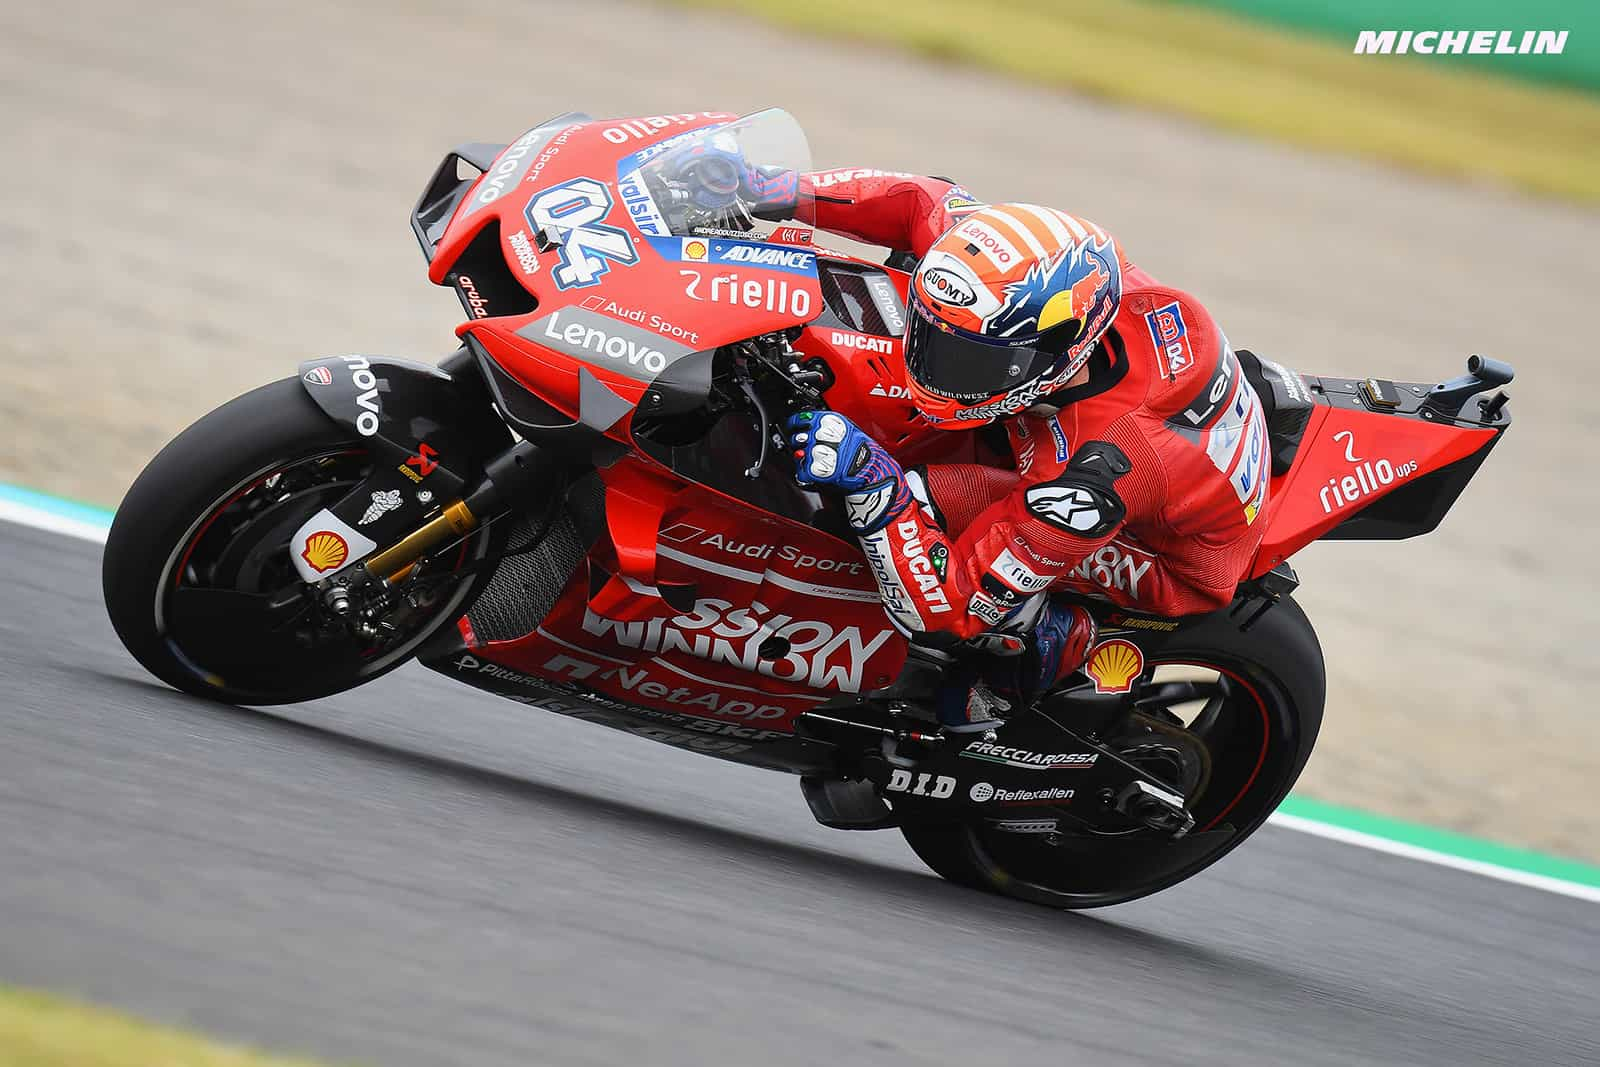 MotoGP2019オーストラリアGP ドヴィツィオーゾ「コンディションに注視が必要」